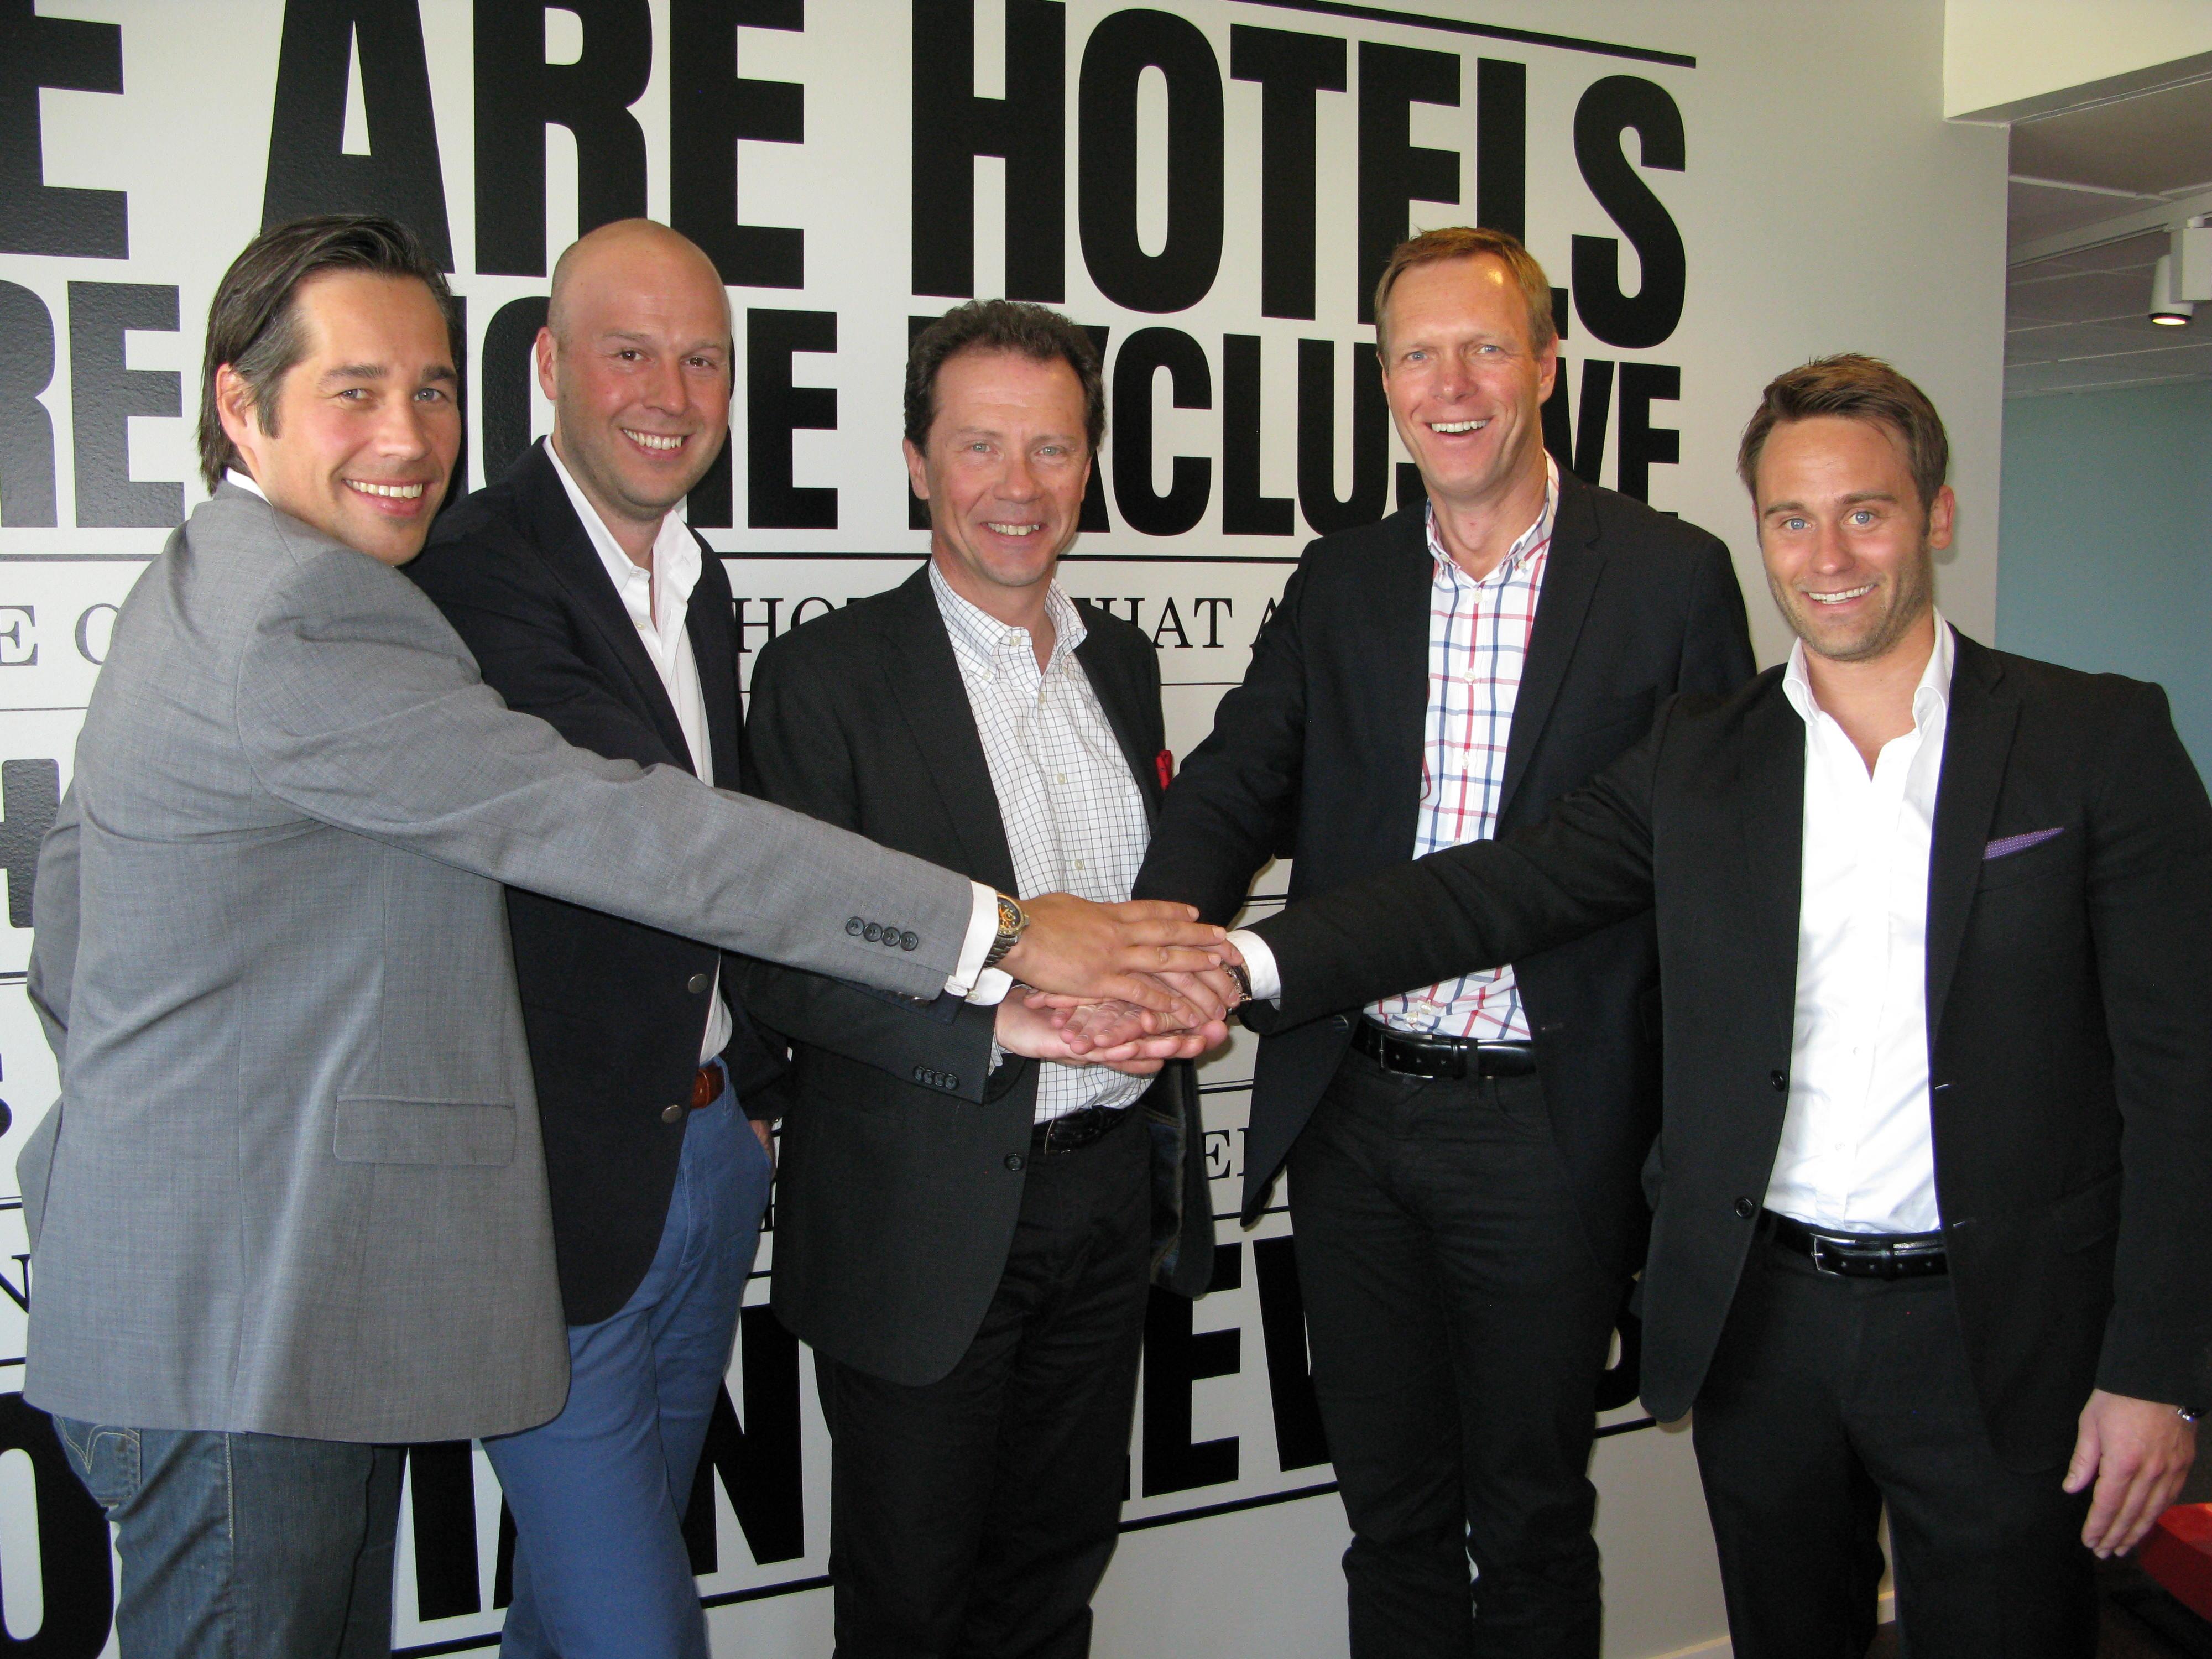 Från vänster; Mathias Kemi, Sponsoringchef Scandic Johan Michelson, Marknadschef Scandic Anders Ehrling, Koncernchef Scandic Carl Pernow, CEO Live Nation Nordic Tobias Ekman, Commercial Director Live Nation Nordic